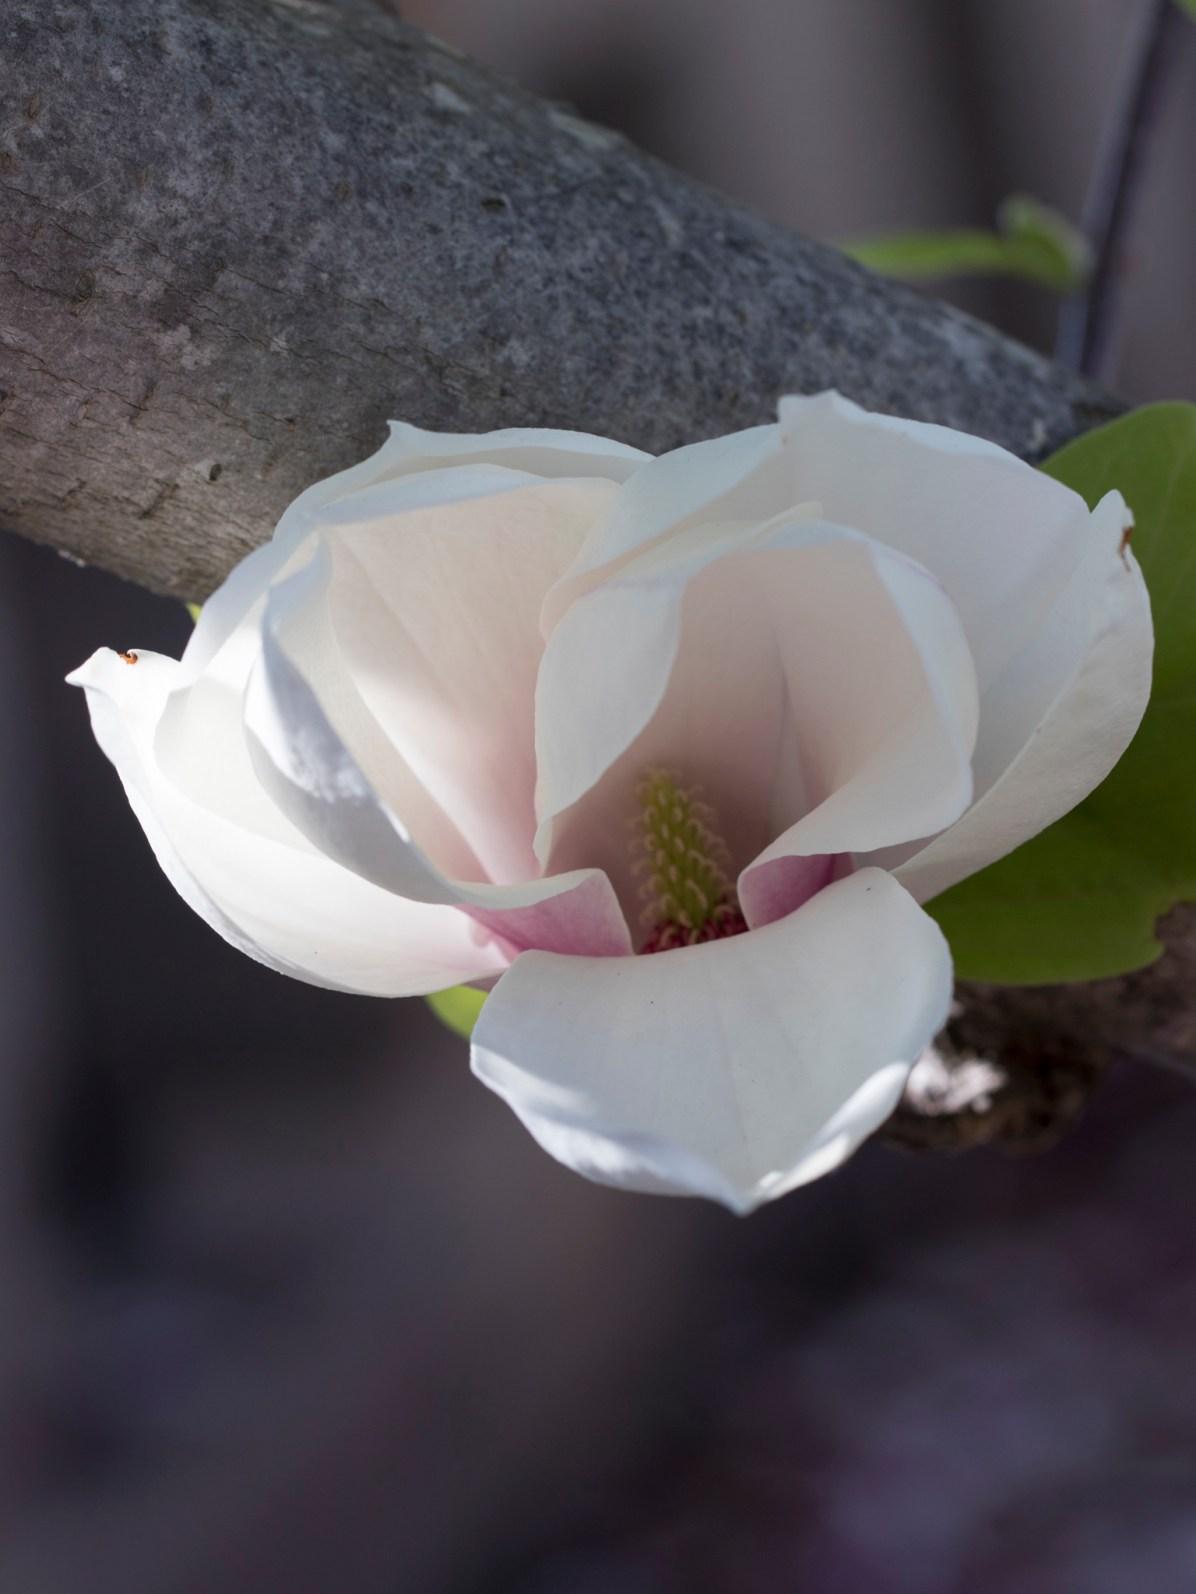 031317white magnolia ray of sun